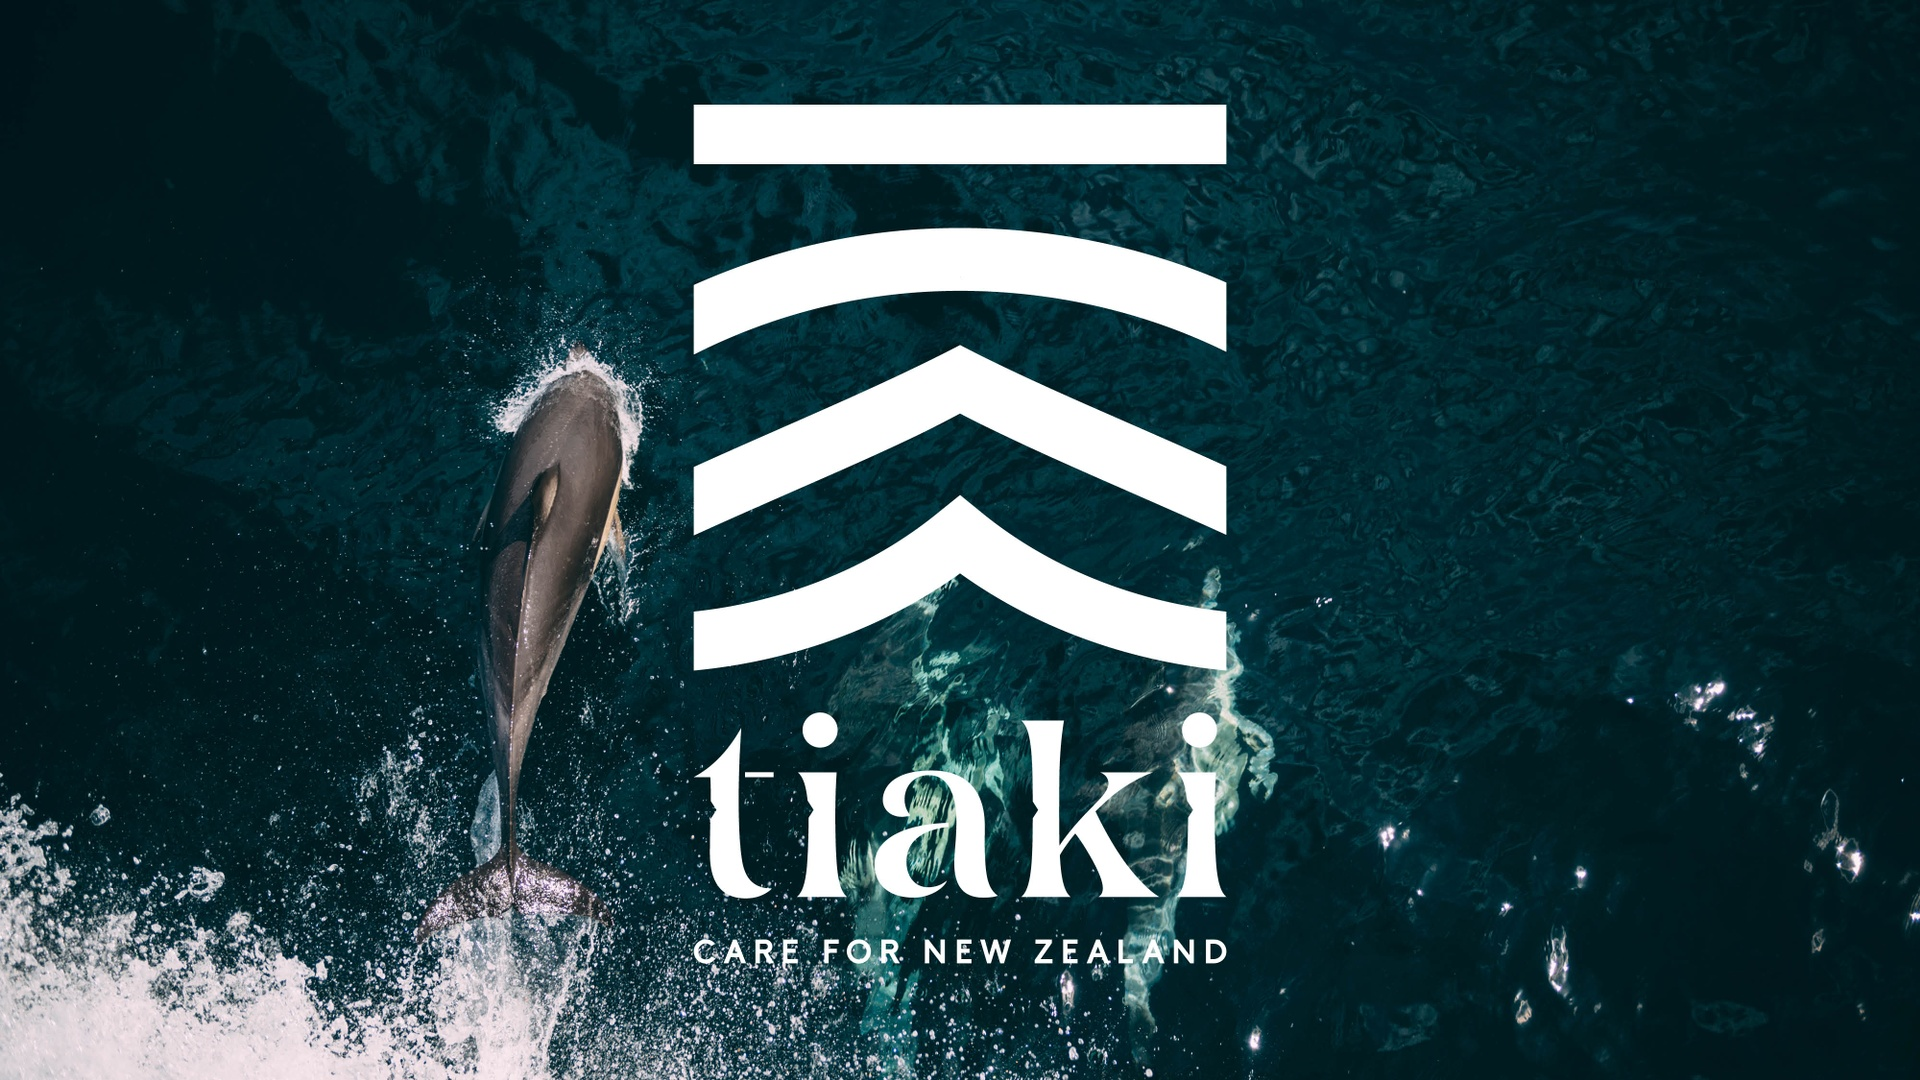 Tiaki Digital Screen 06.jpeg